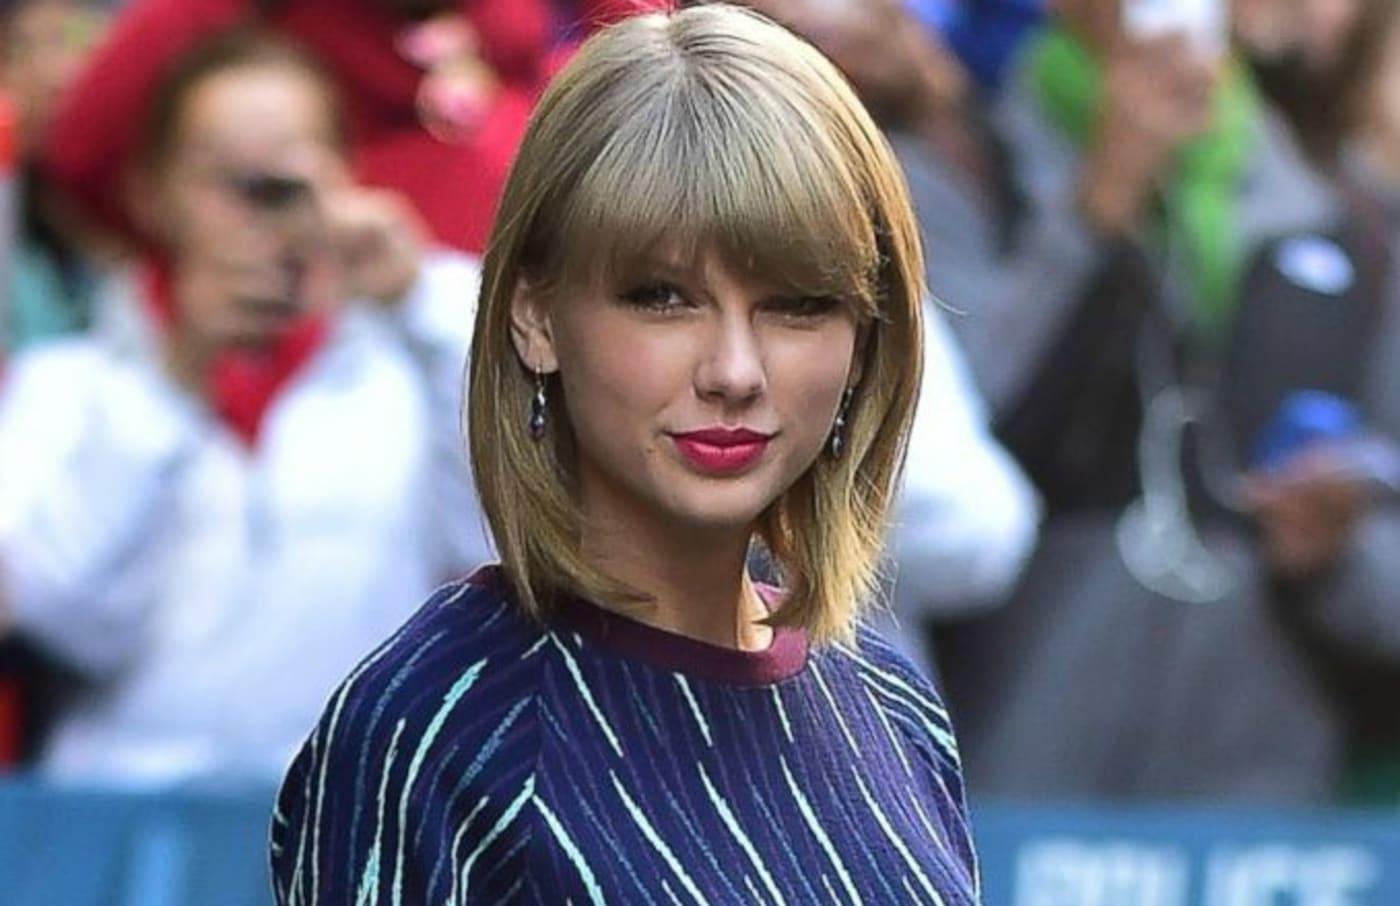 Taylor Swift Donated $50K to New York City Public Schools